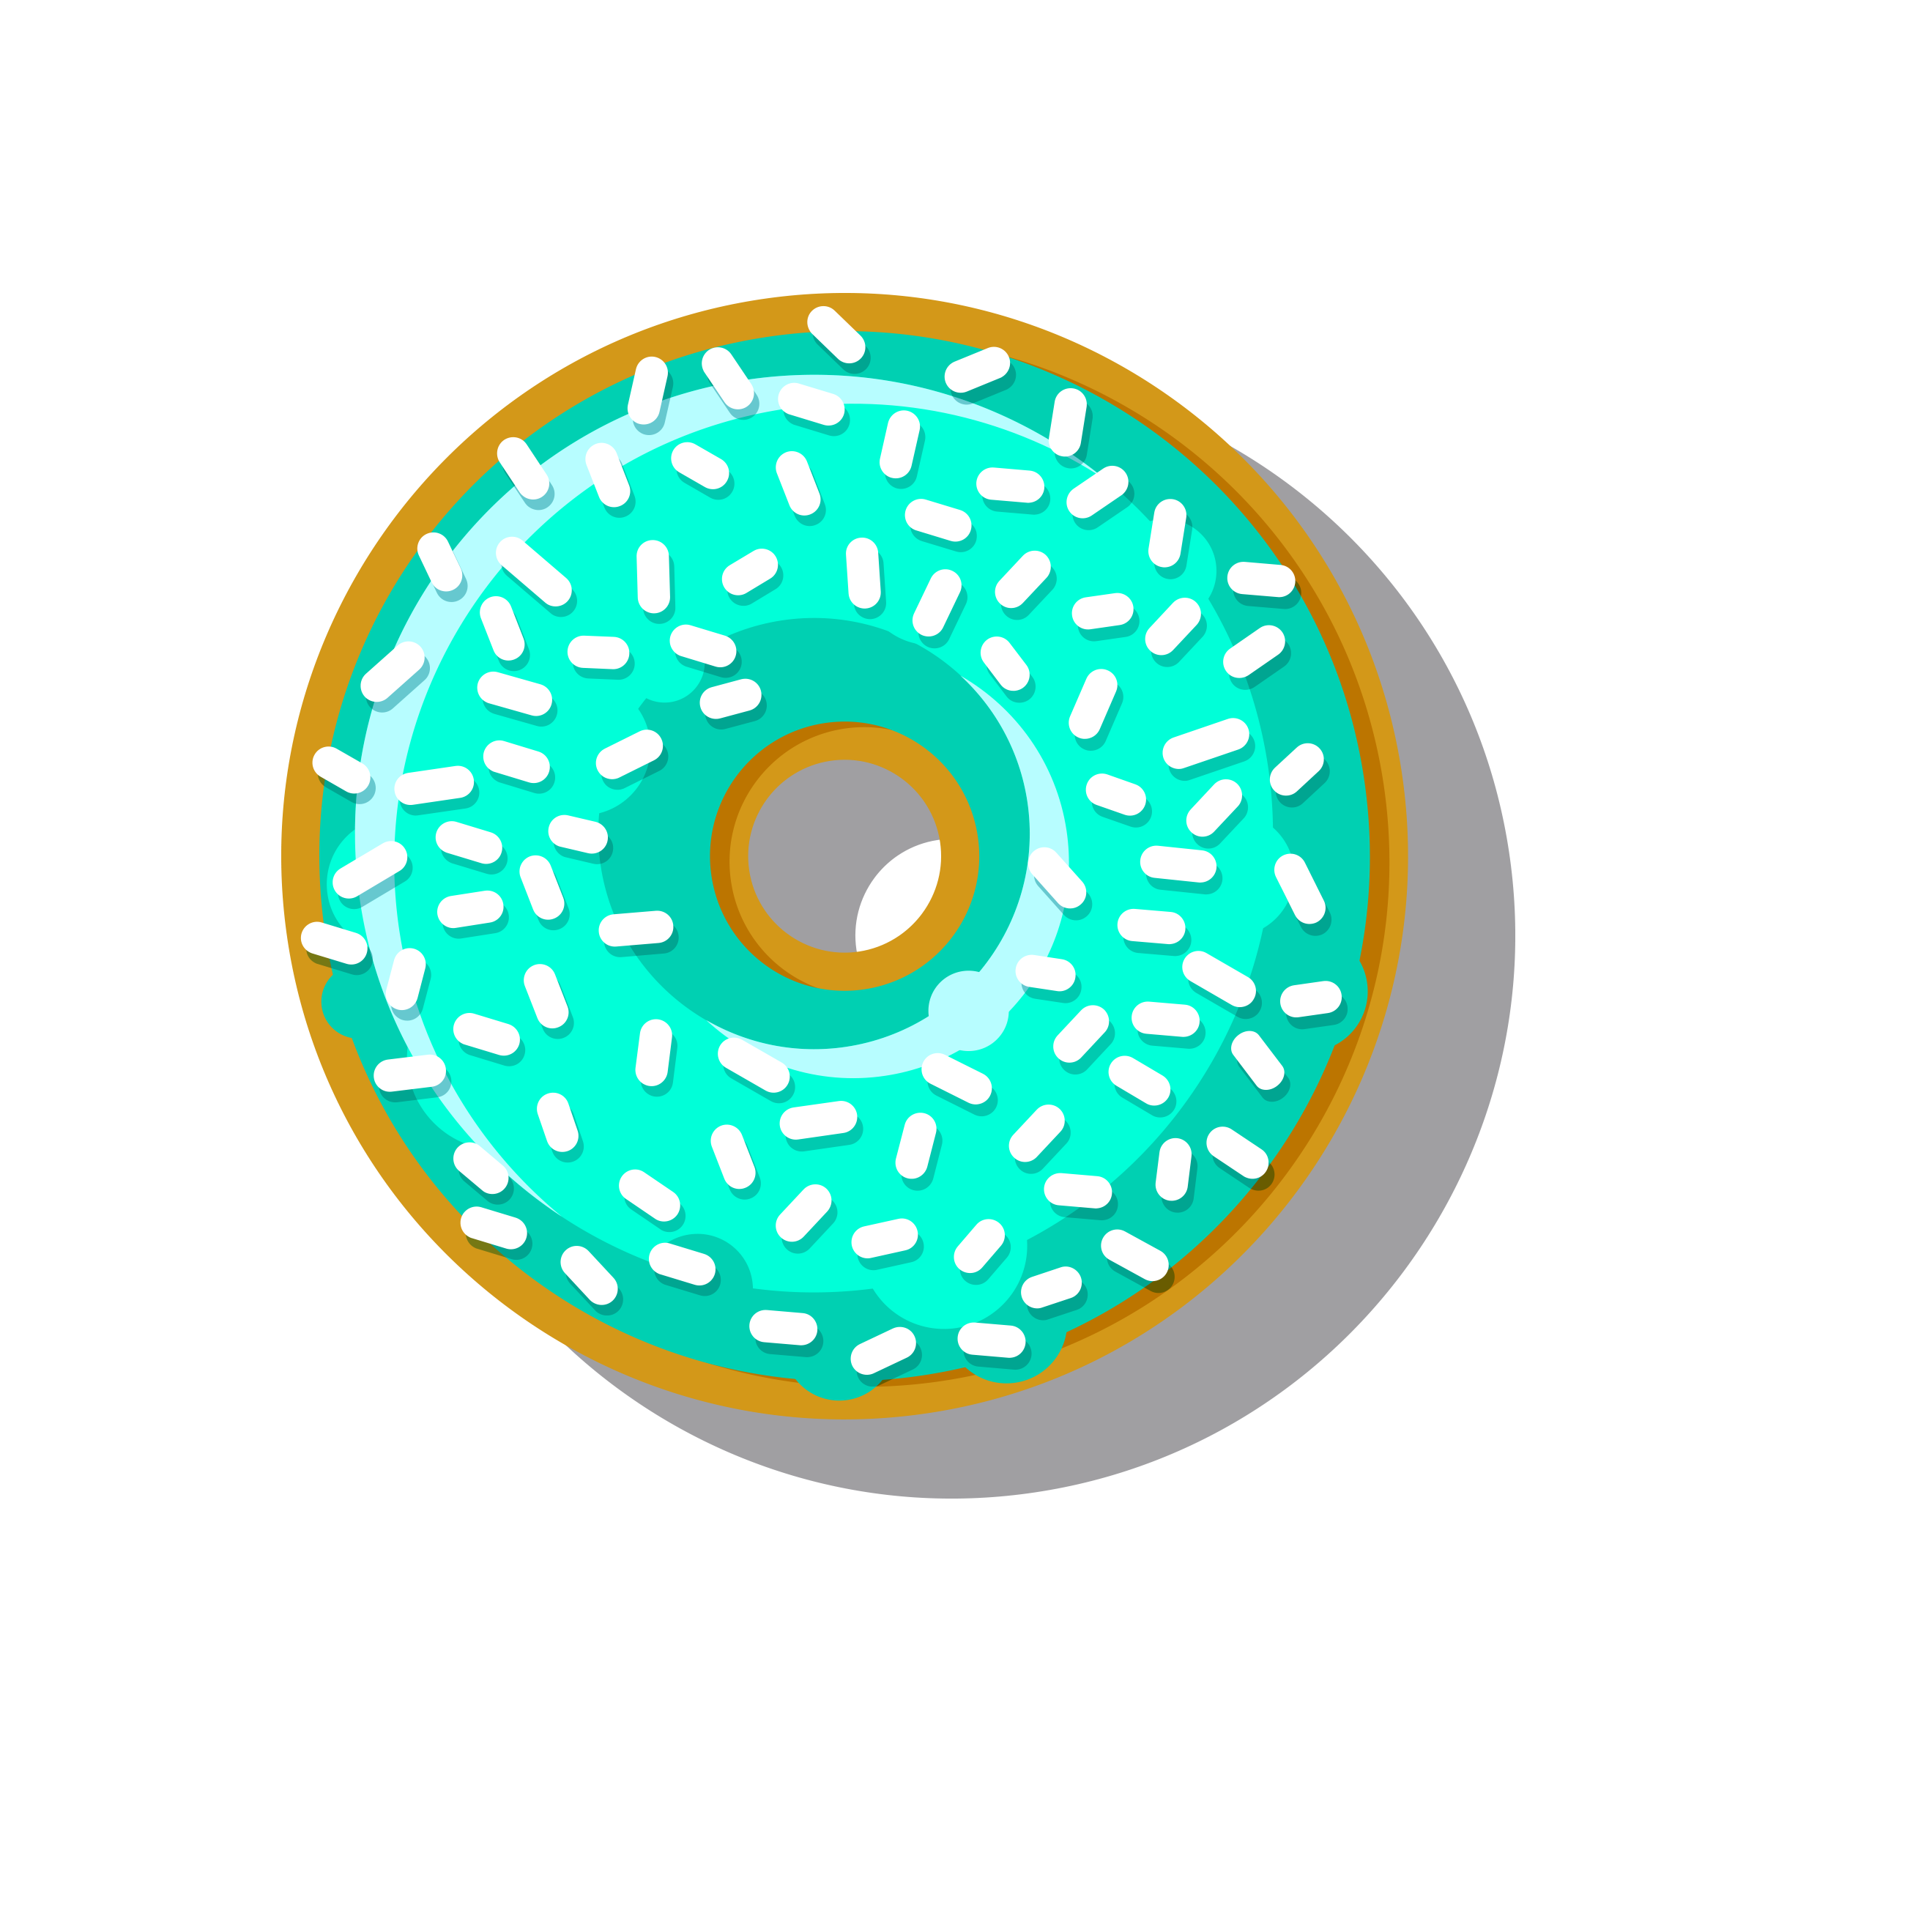 Donut clipart red. Pink jokingart com download